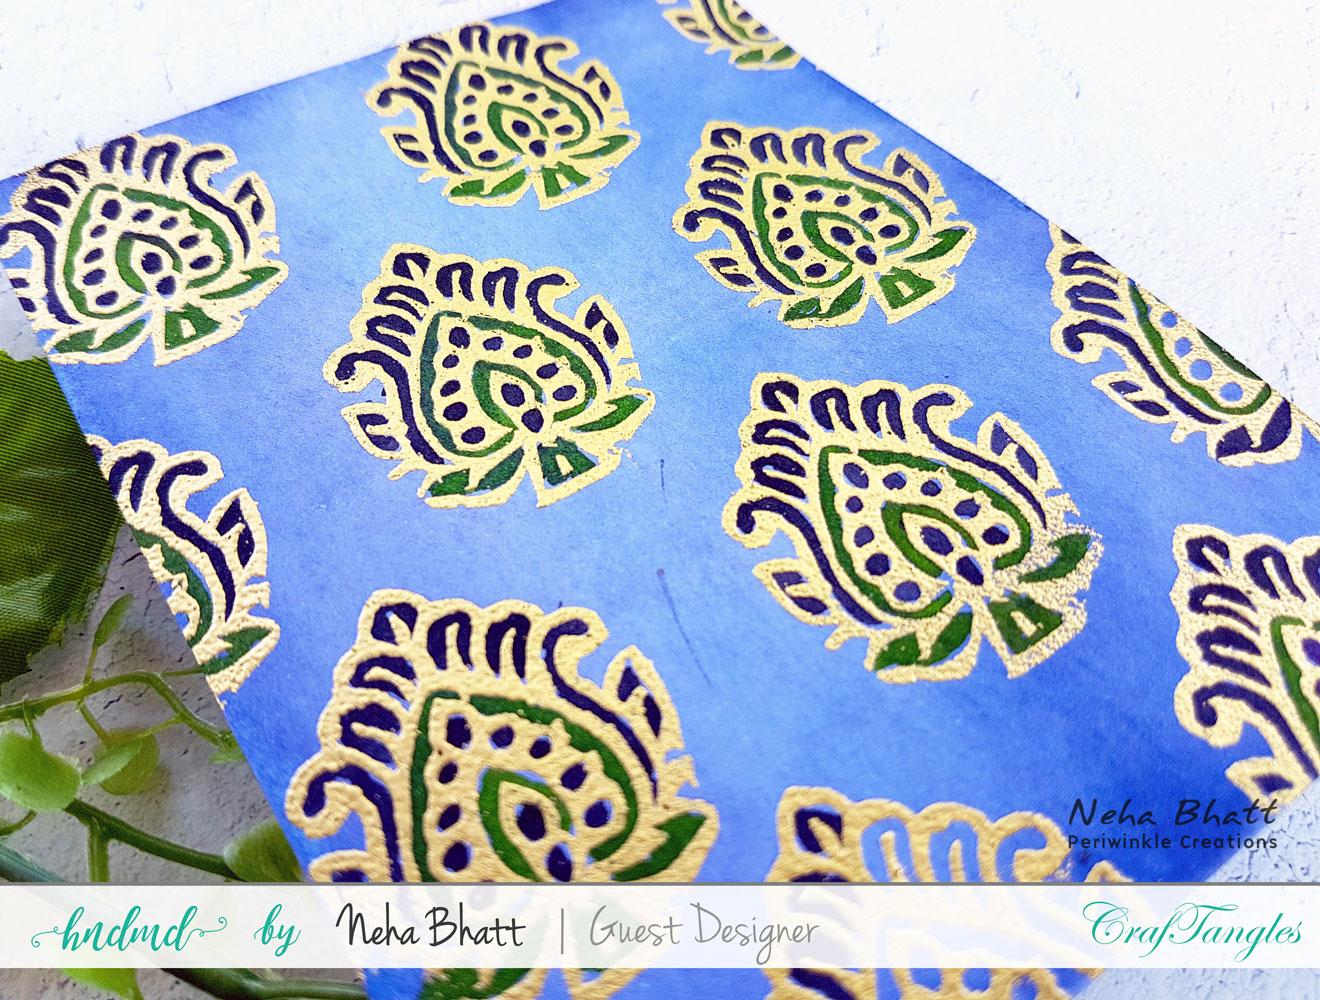 Fun watercolor inspirations by Neha Bhatt using CrafTangles liquid watercolors 11